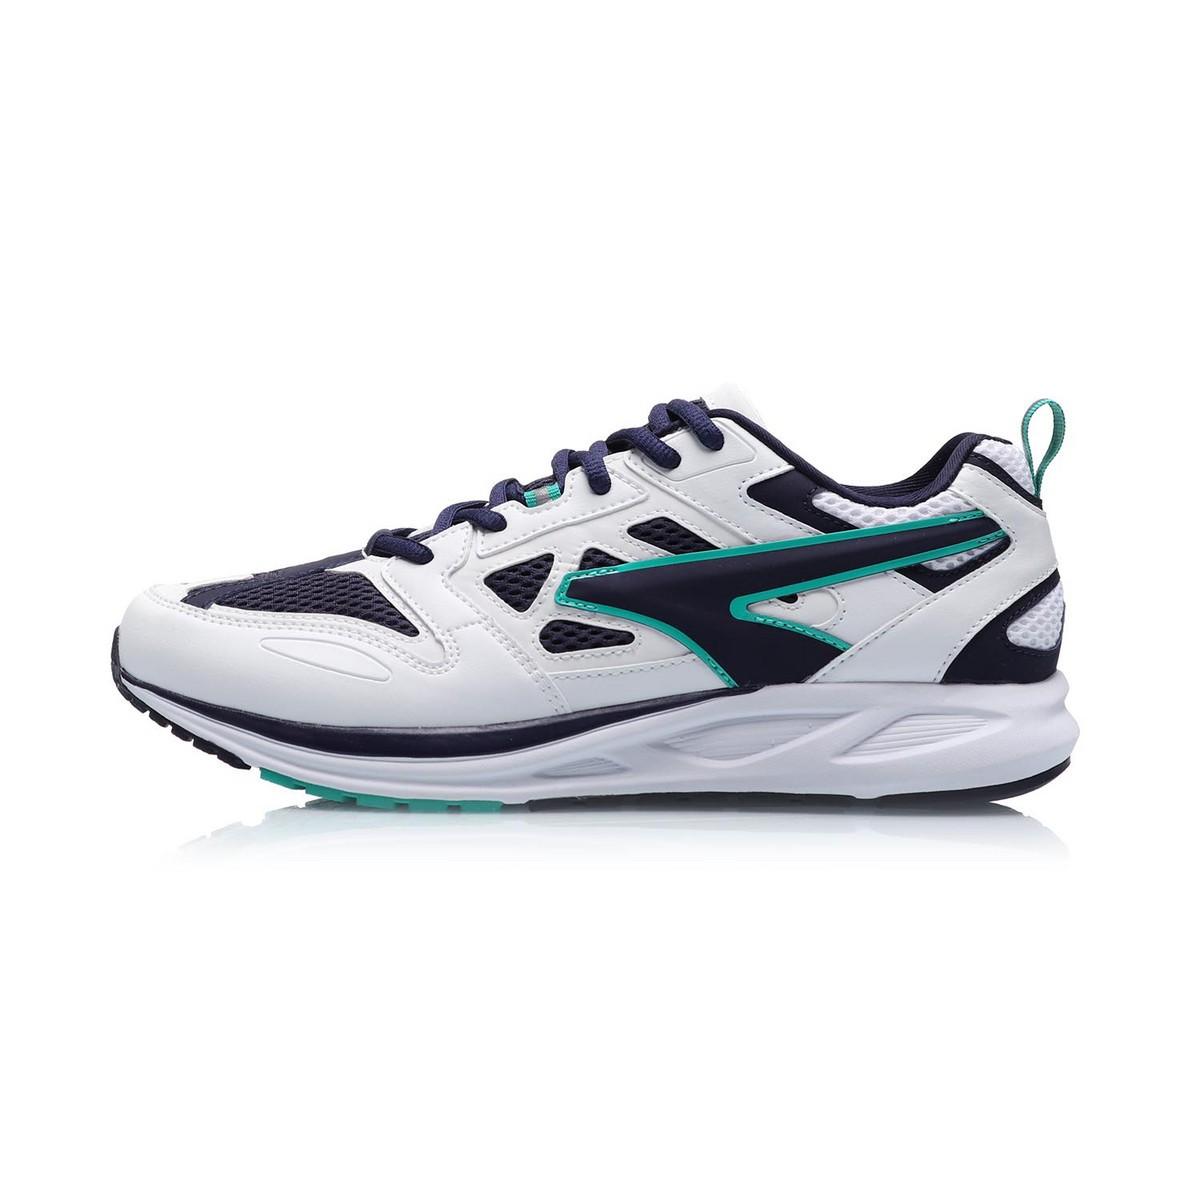 LI-NING 李宁 男士休闲运动鞋 ARHP103-4 标准白/深碗蓝/青碧绿 39